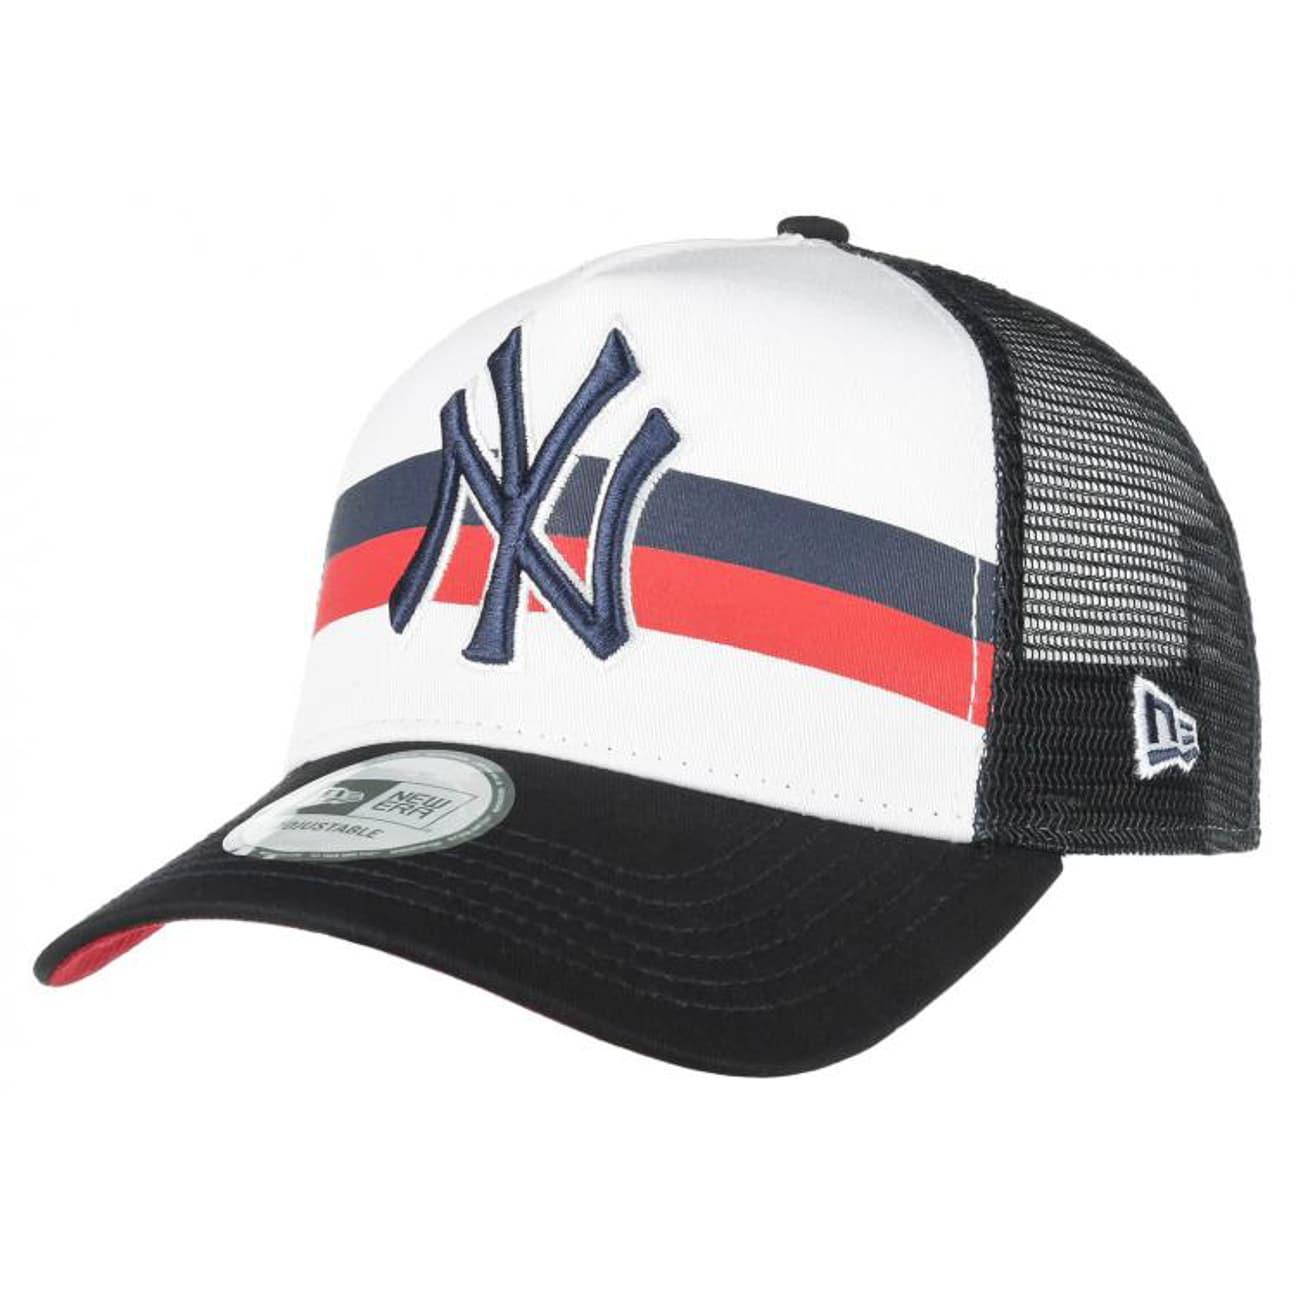 NY Stripe Out Cap by New Era - nero 1 5e23dc7165be